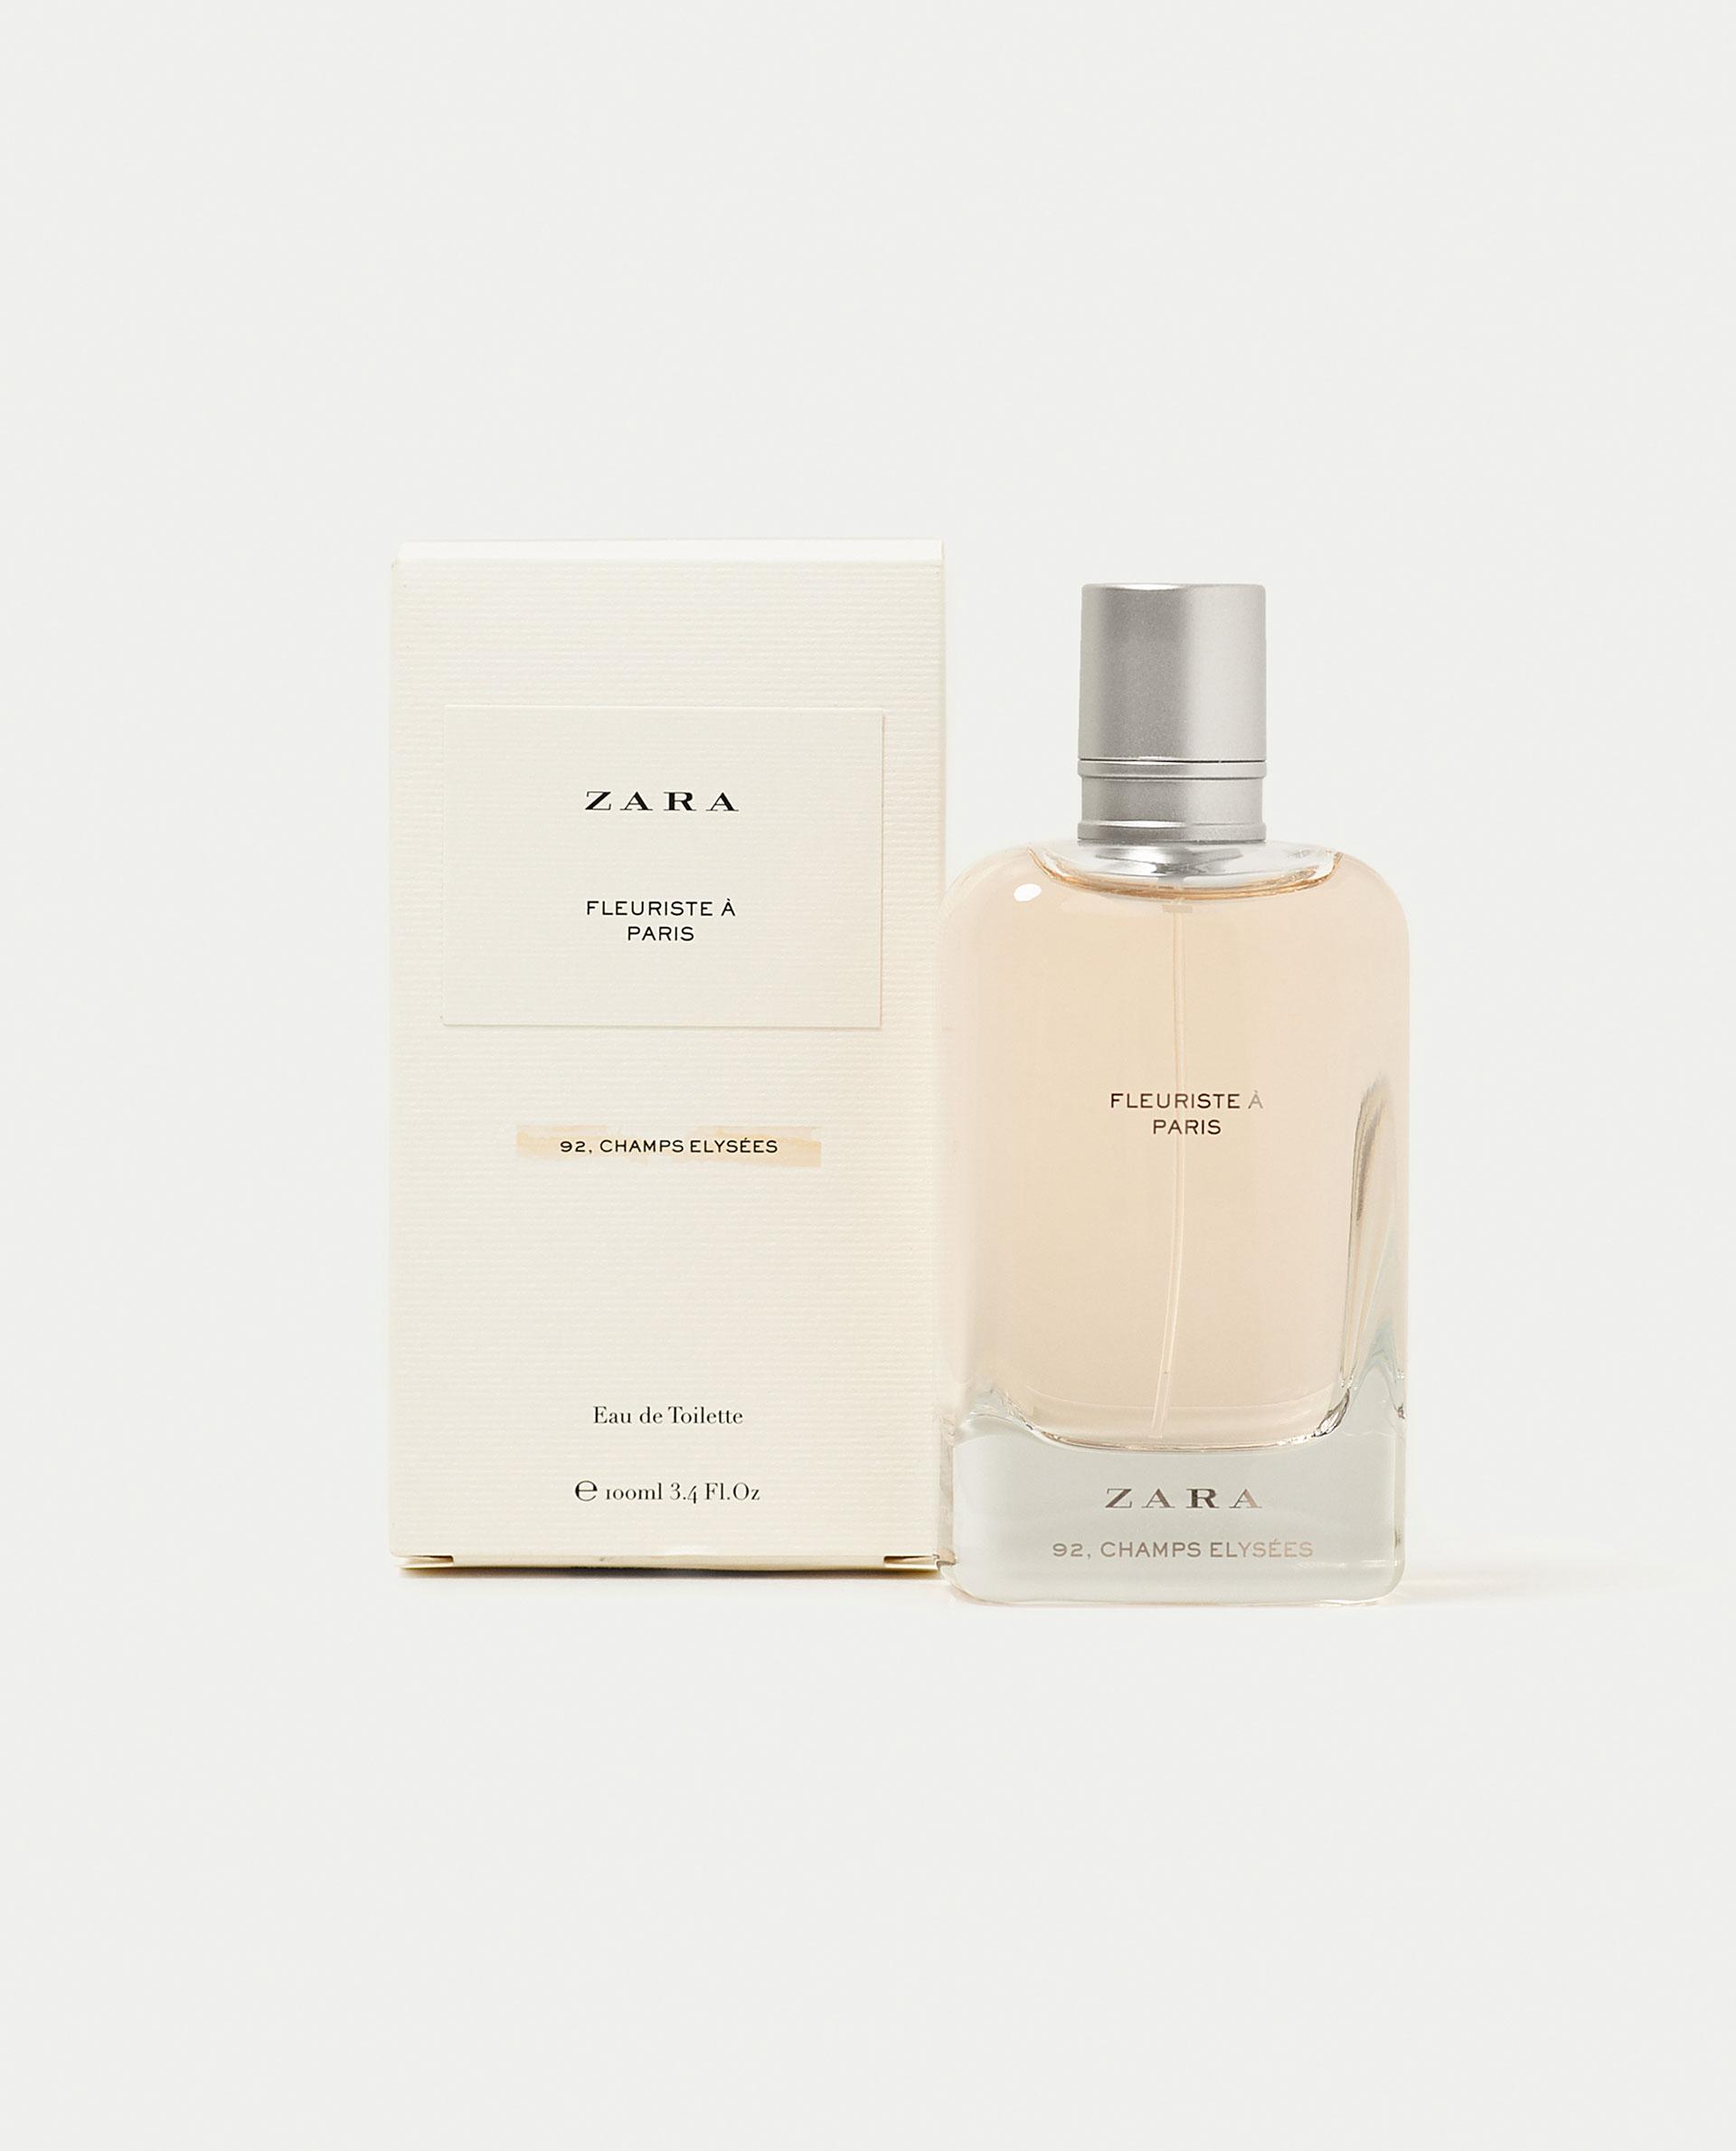 fleuriste a paris zara perfume a new fragrance for women. Black Bedroom Furniture Sets. Home Design Ideas